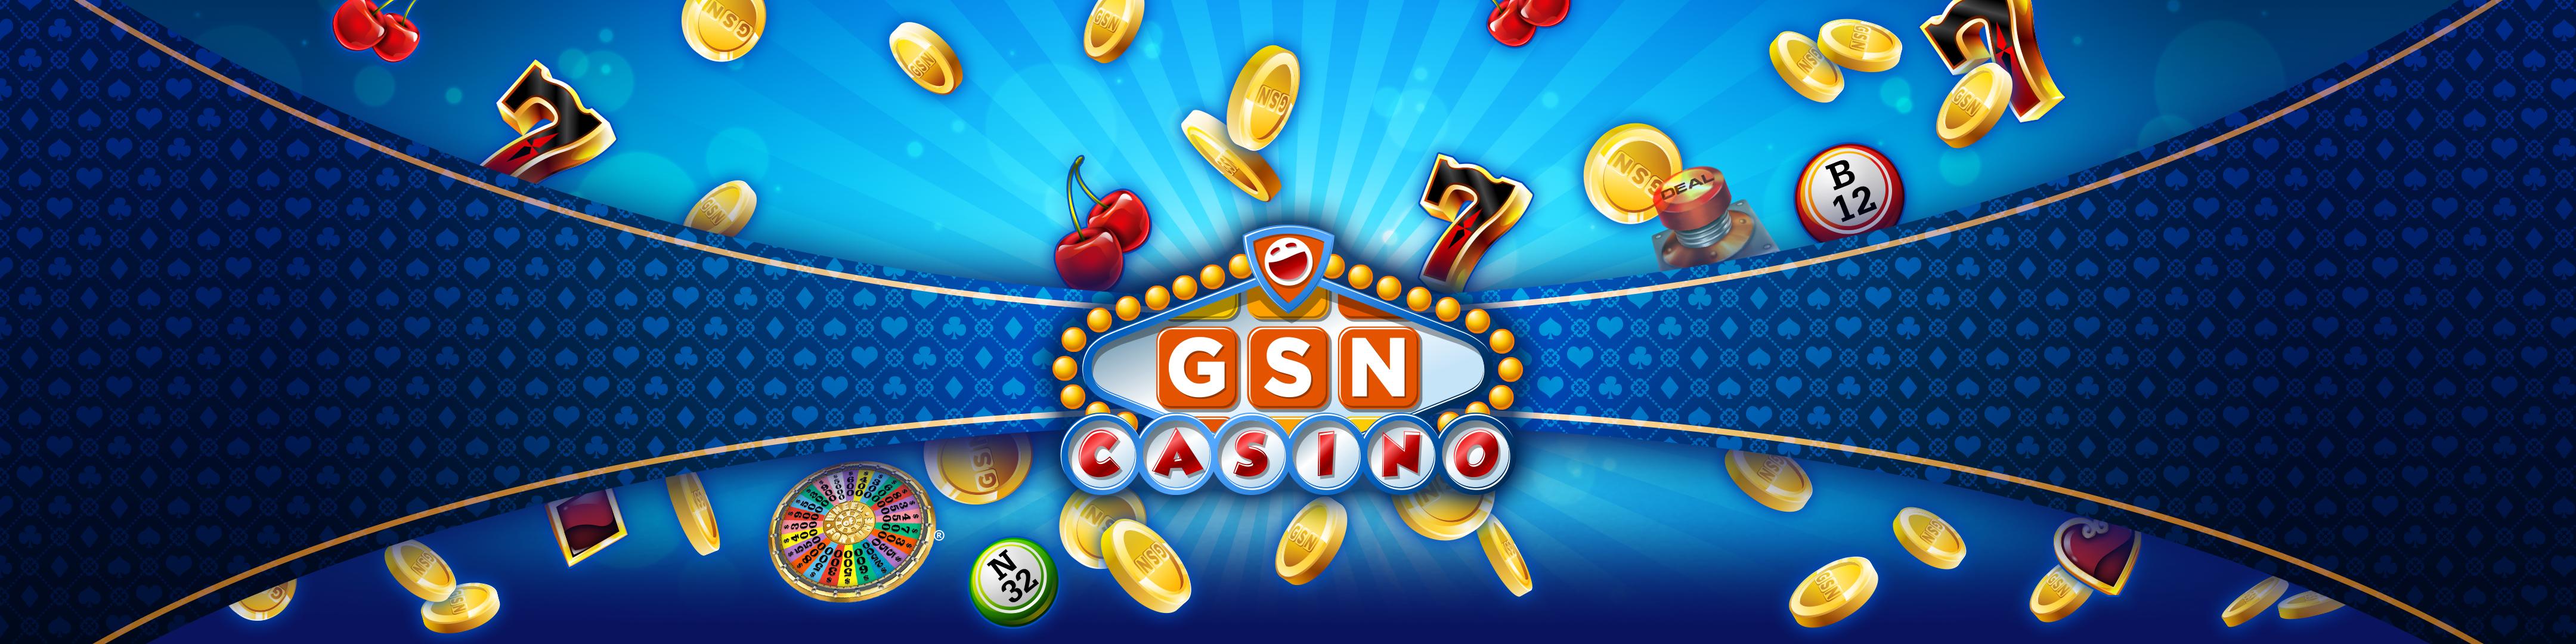 free coins gsn casino